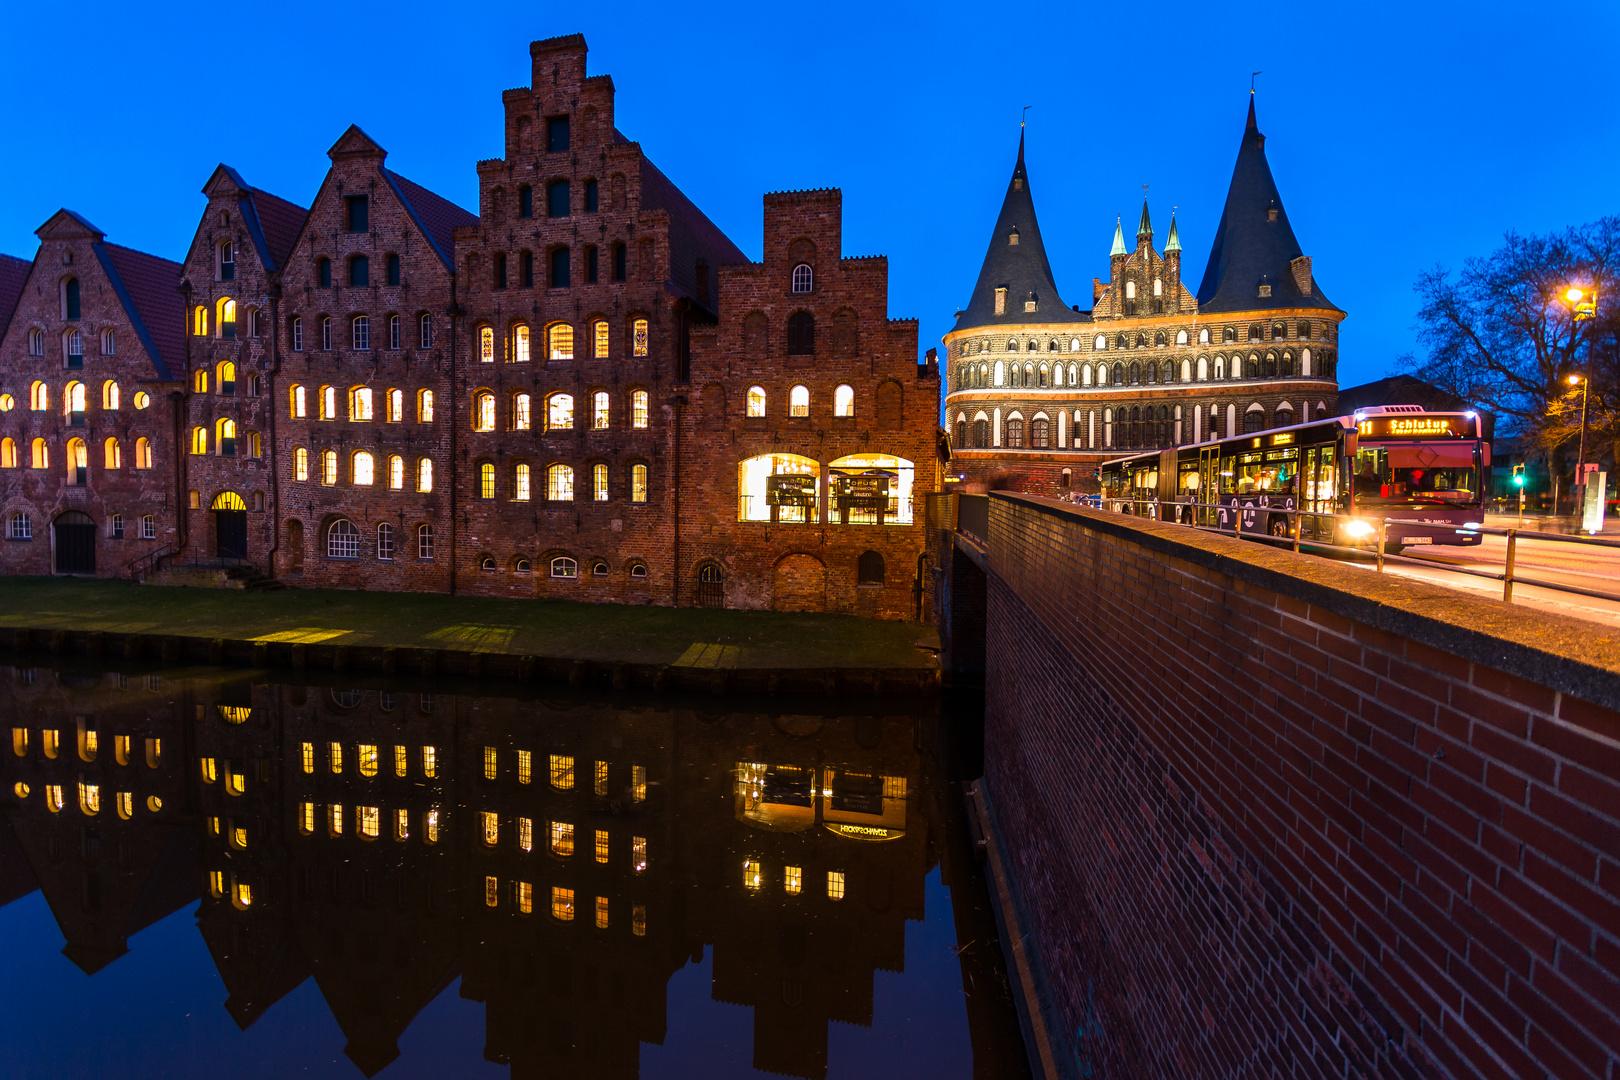 ...Desshalb mag ich Lübeck so